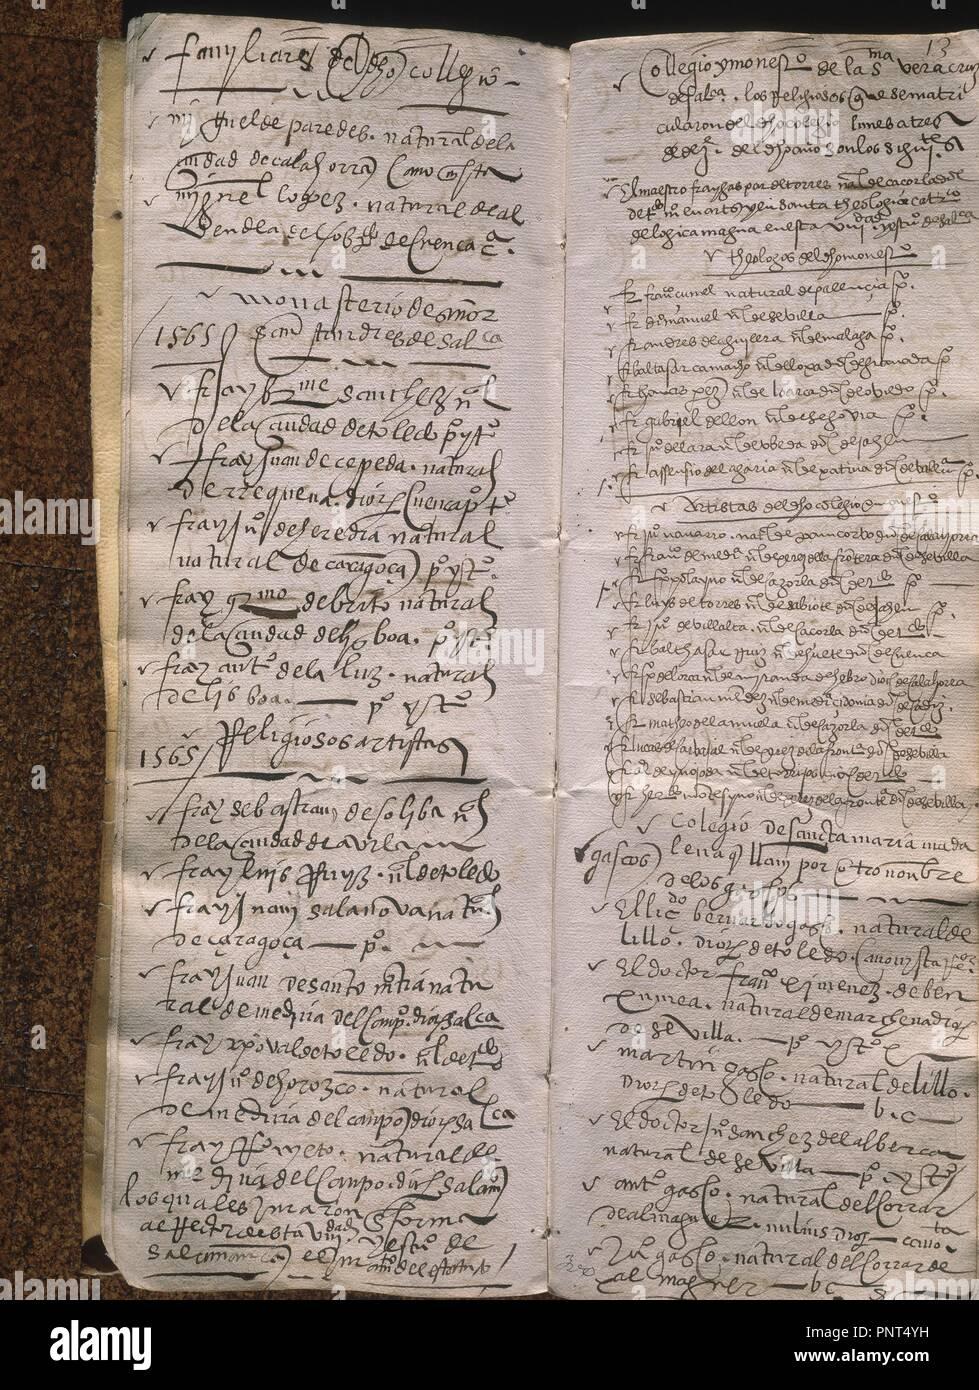 LIBRO DE MATRICULA -1565-6 - LISTA - ENTRE ELLOS S JUAN D LA CRUZ. Ort: UNIVERSIDAD BIBLIOTECA. SALAMANCA. Spanien. Stockfoto